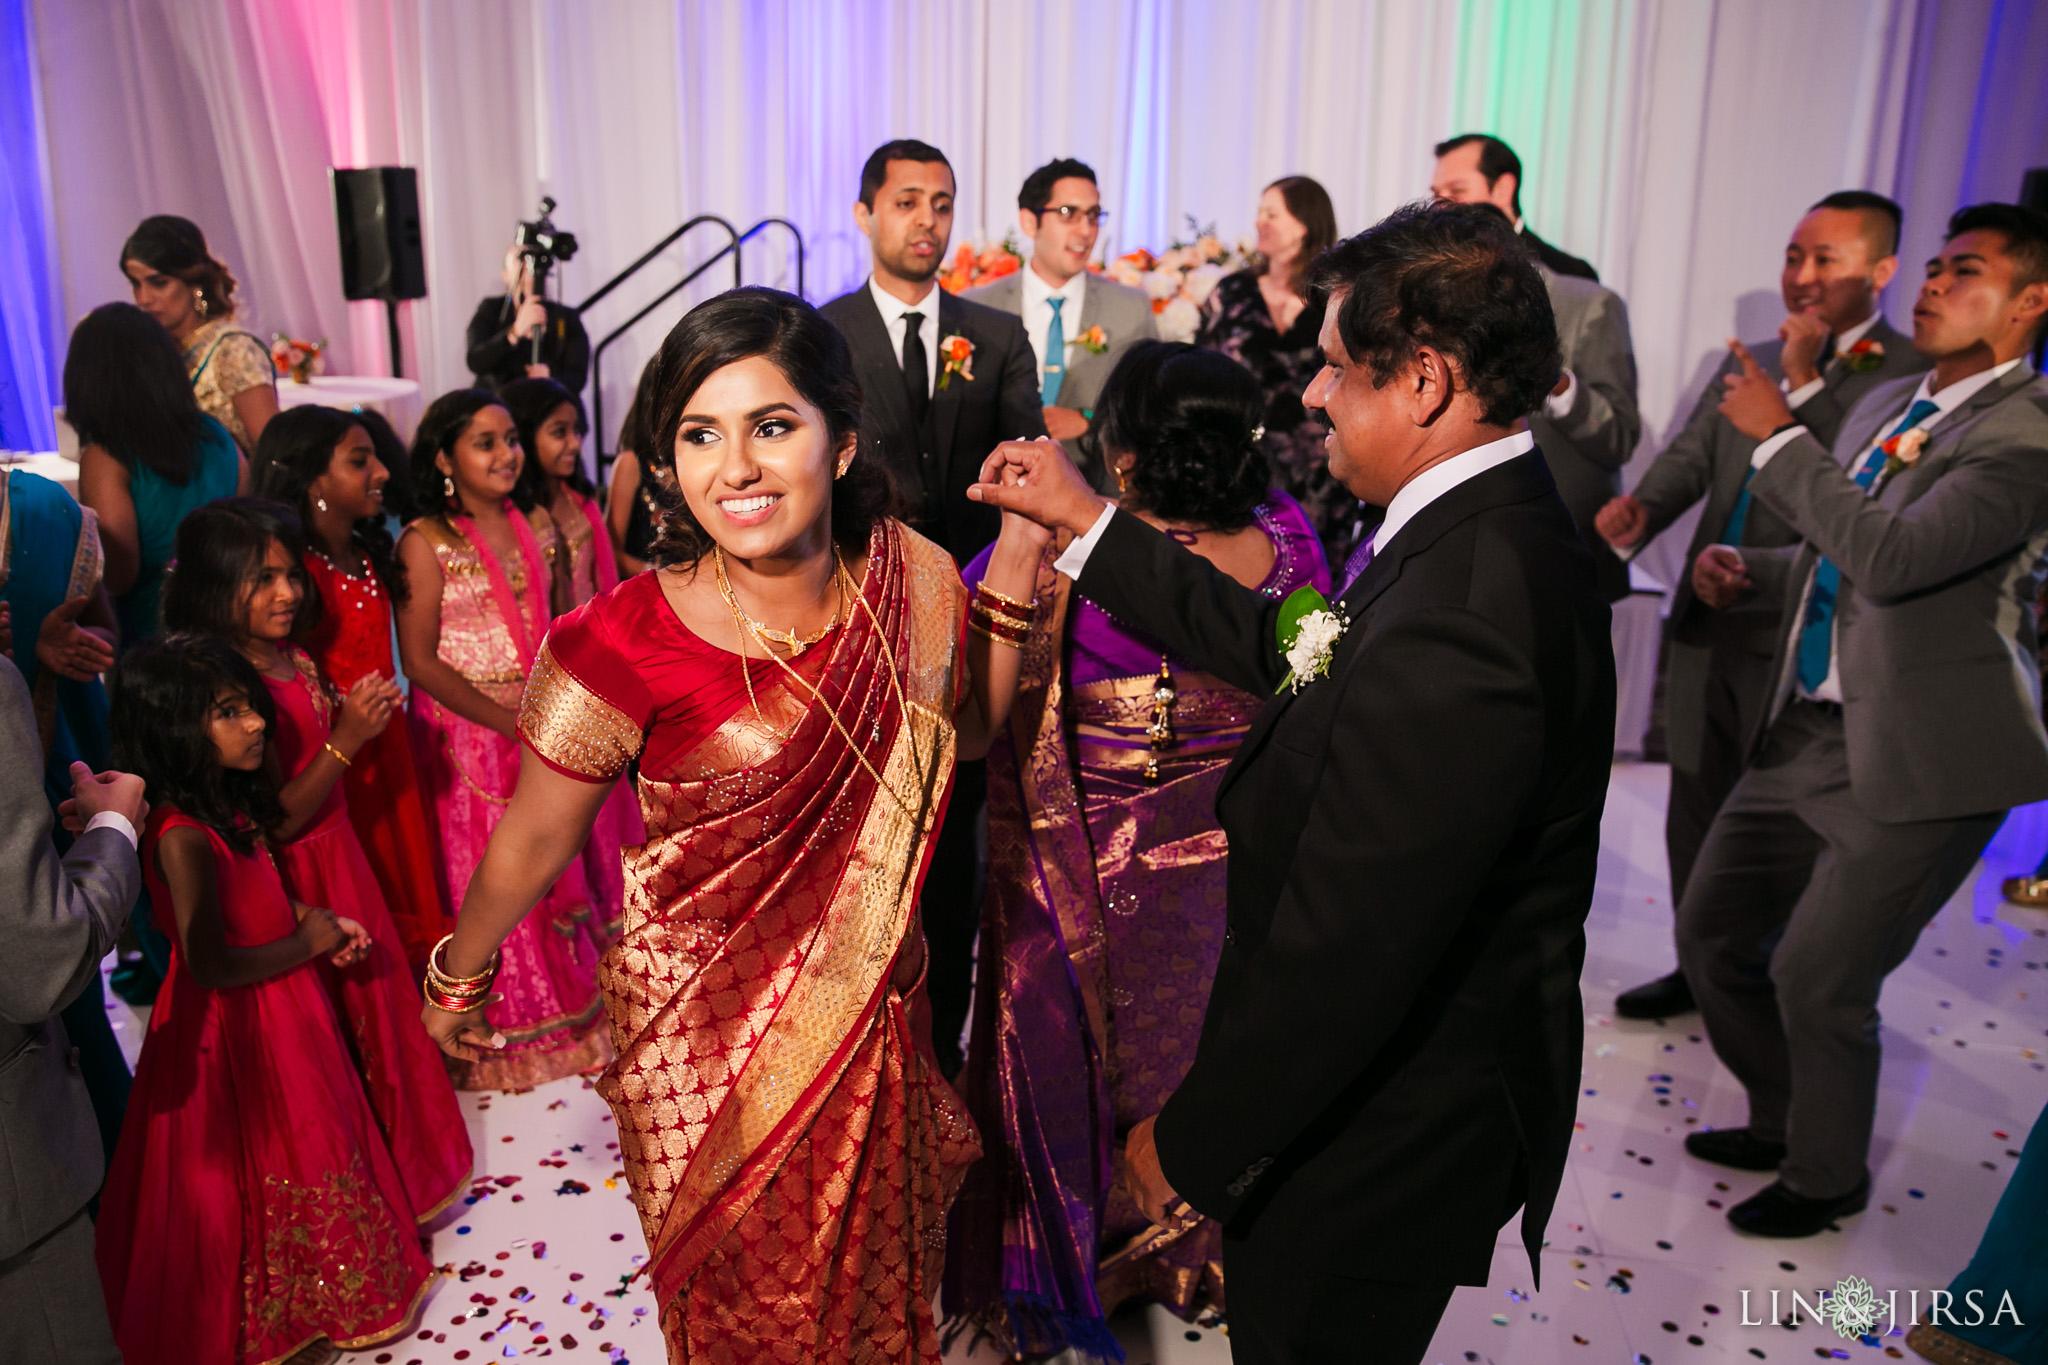 40 sheraton fairplex inland empire indian wedding photography